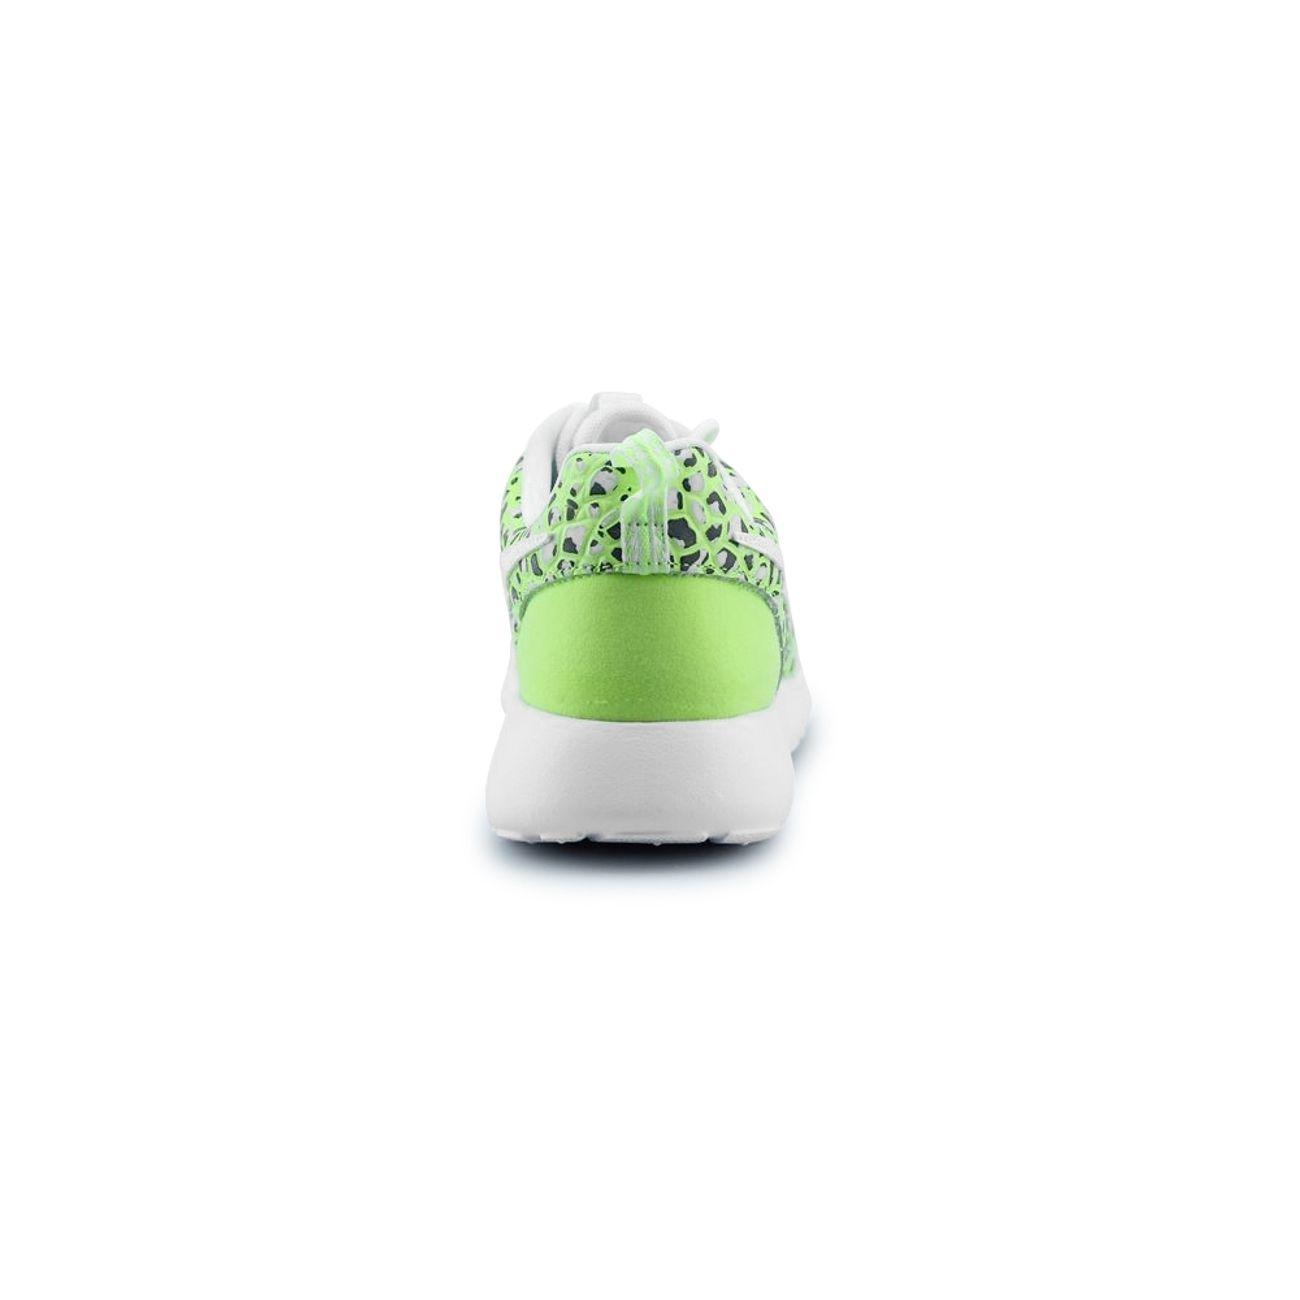 magasin en ligne 93217 7b38b Basket Nike Wmns Roshe One Premium Blanc 833928-100 – achat ...